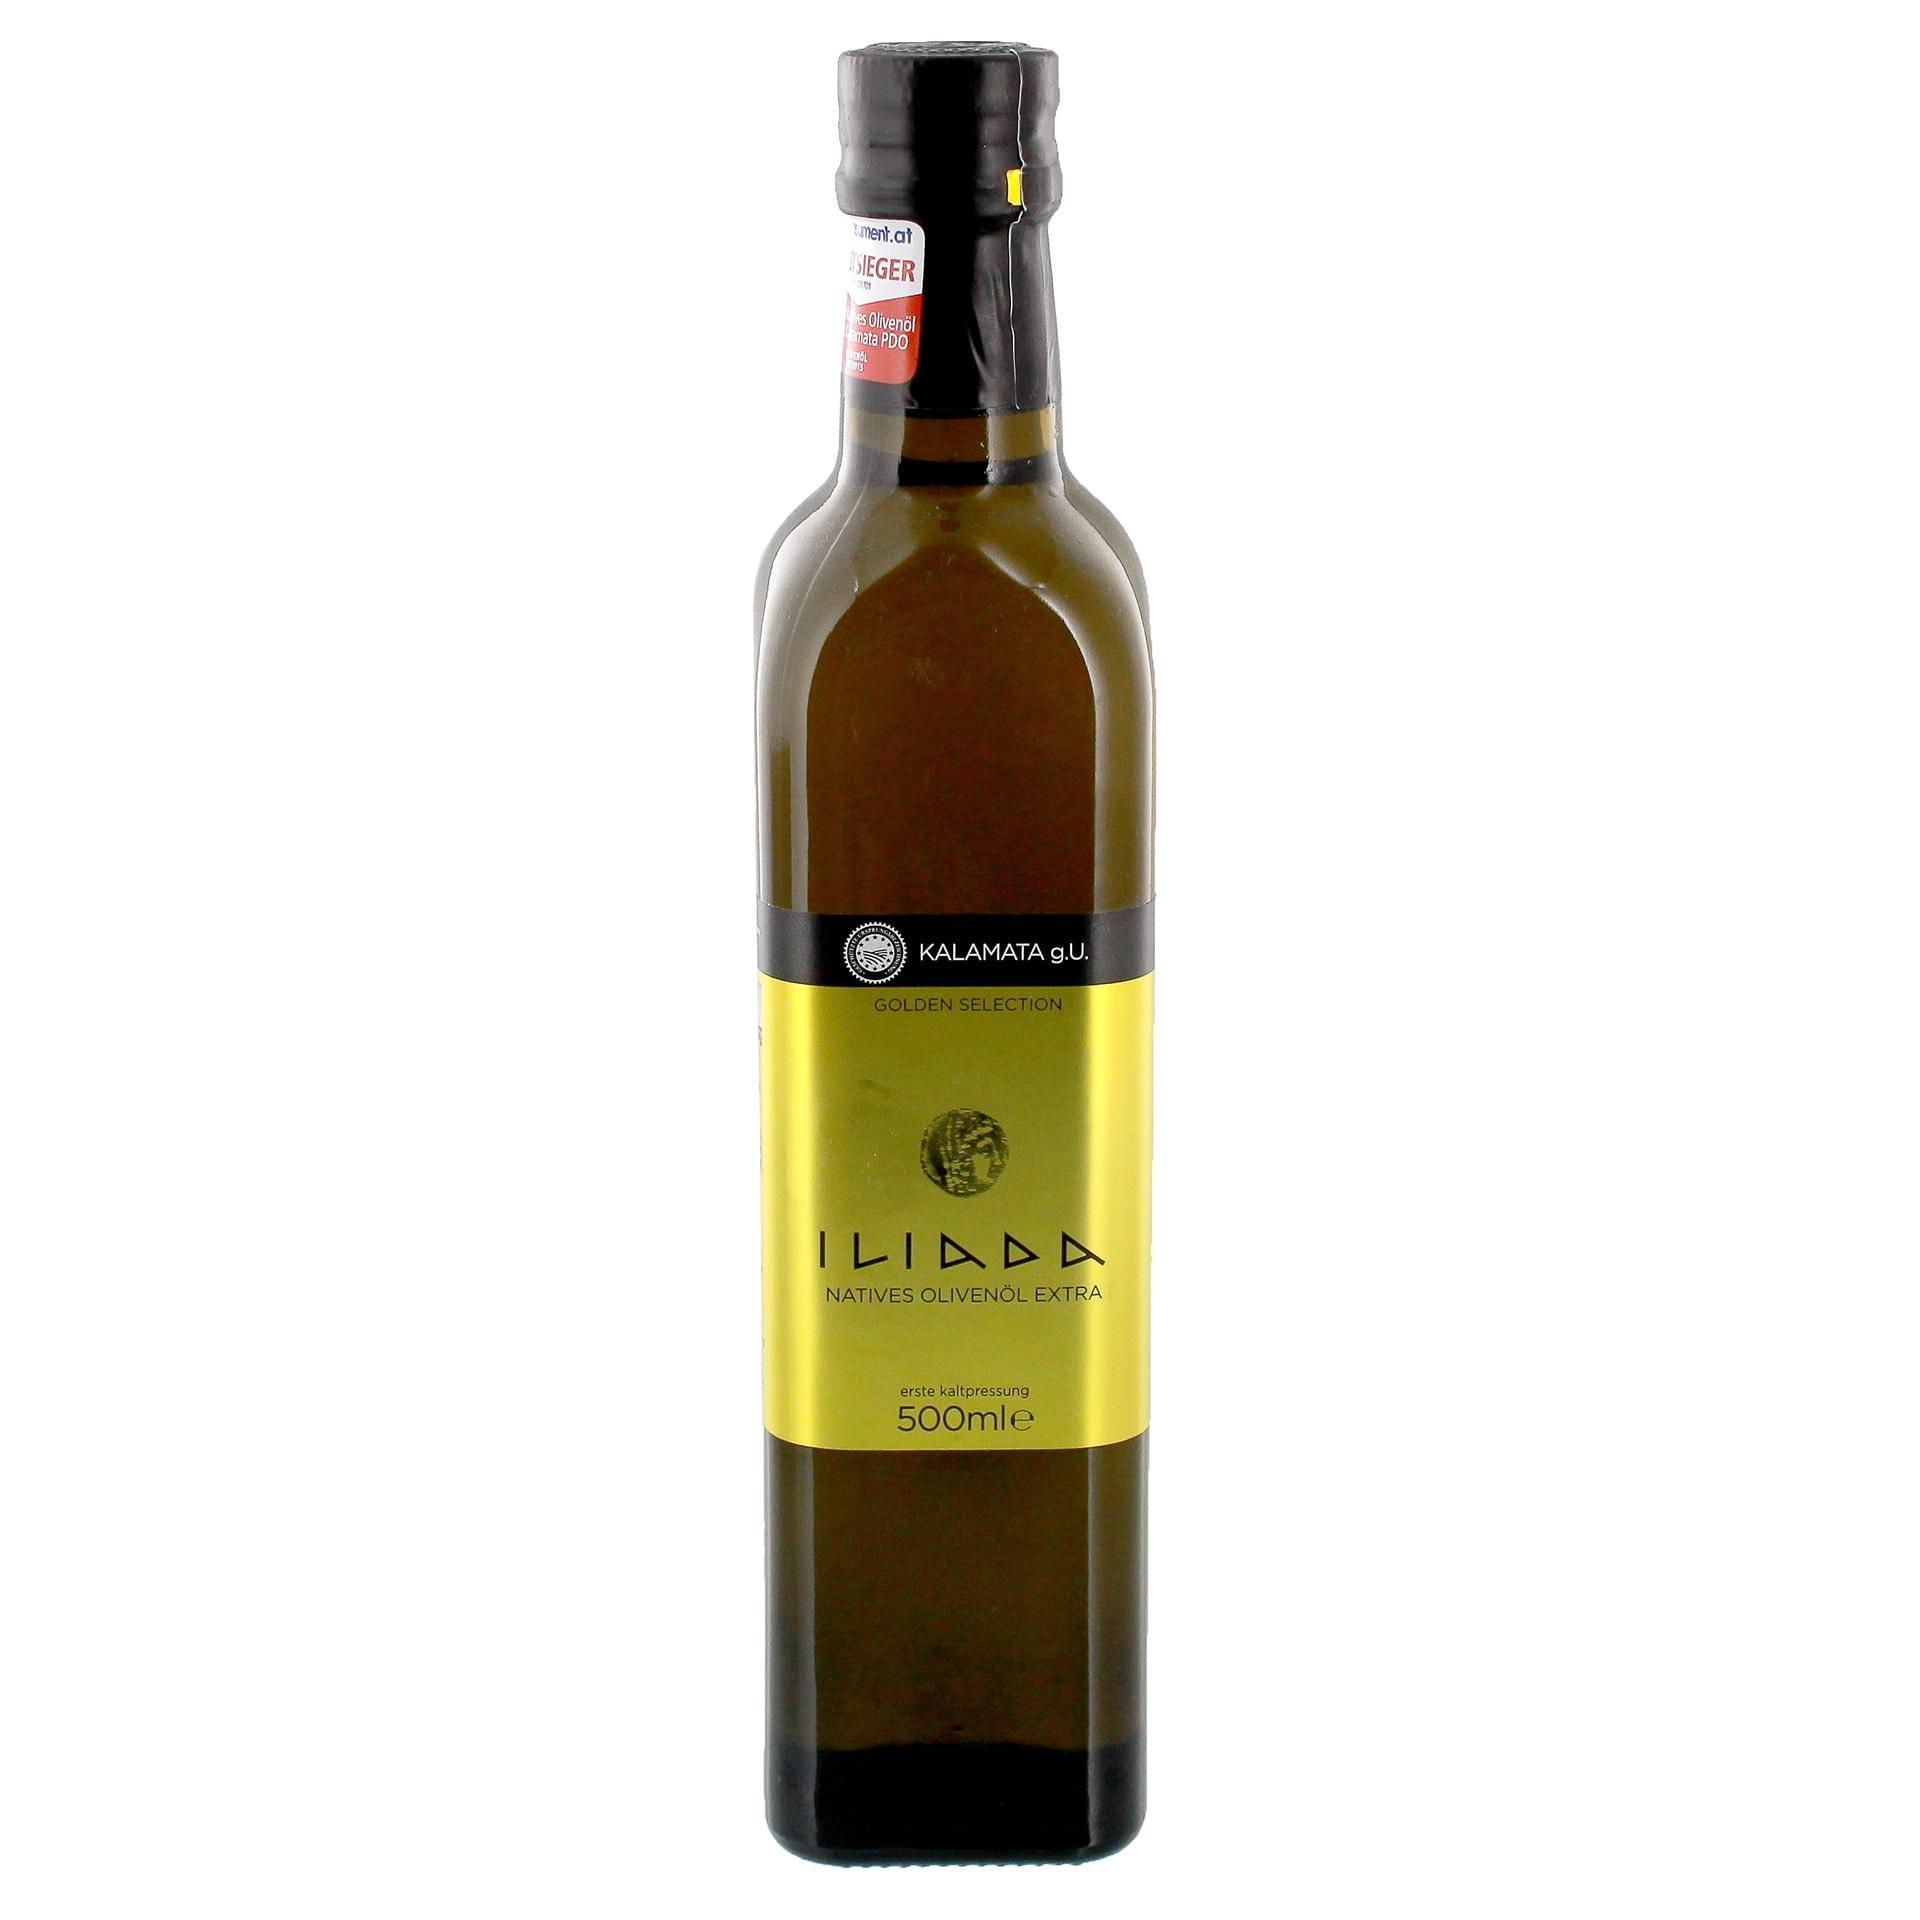 Iliada - Natives Olivenöl Extra Kalamata g.U. - 500ml